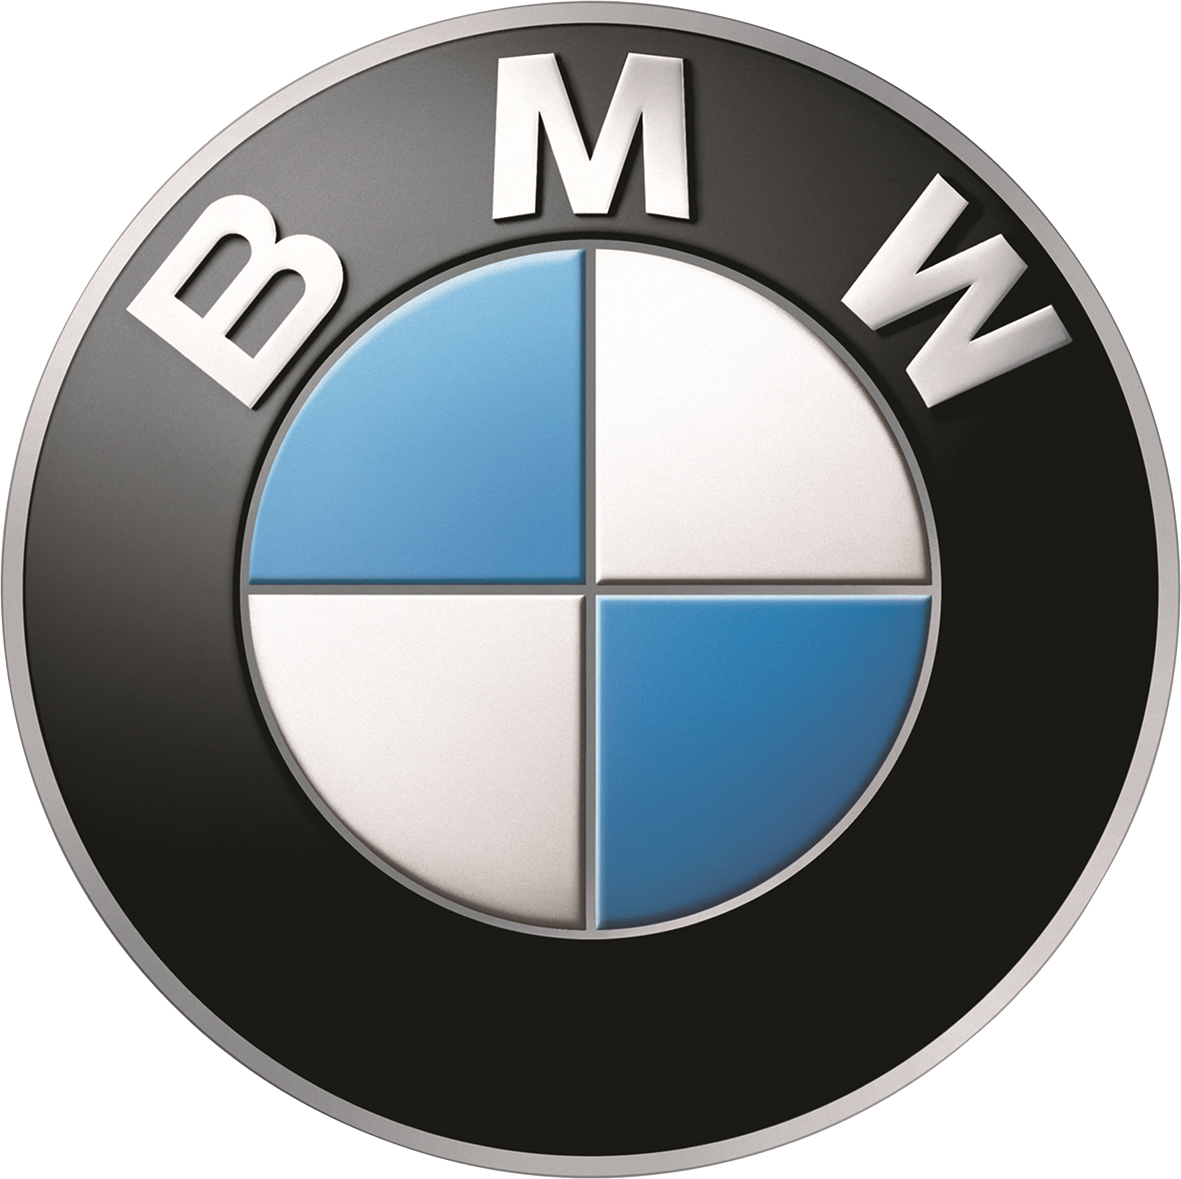 bmwsymb_x4ofc100p0cxeps-5906x_SmallerX2.png